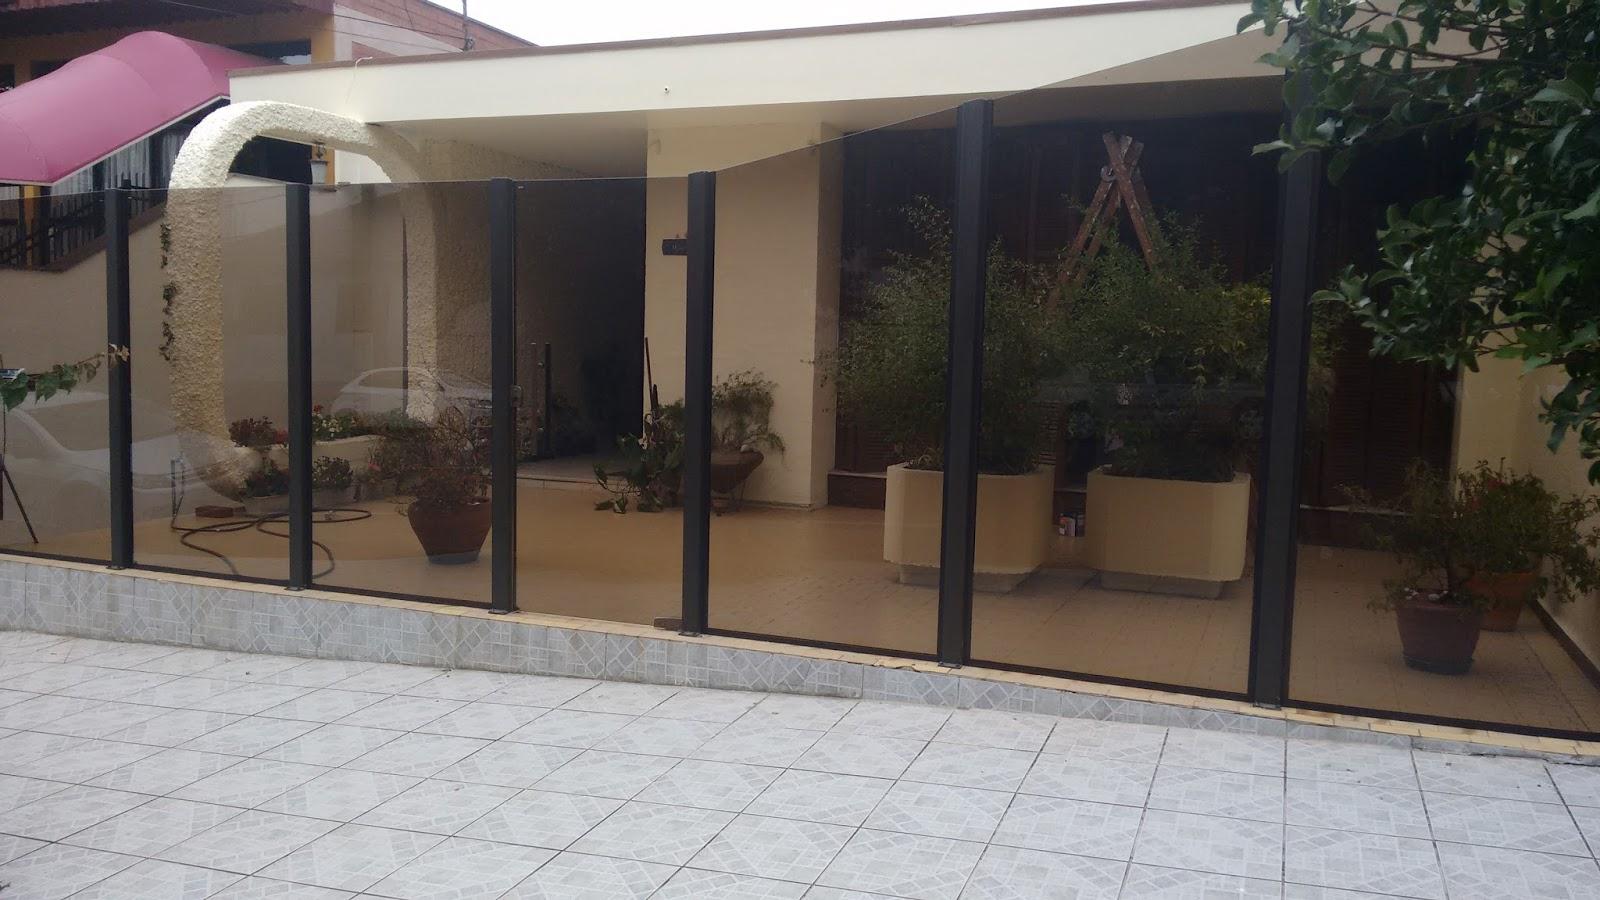 Muro de vidro bronze